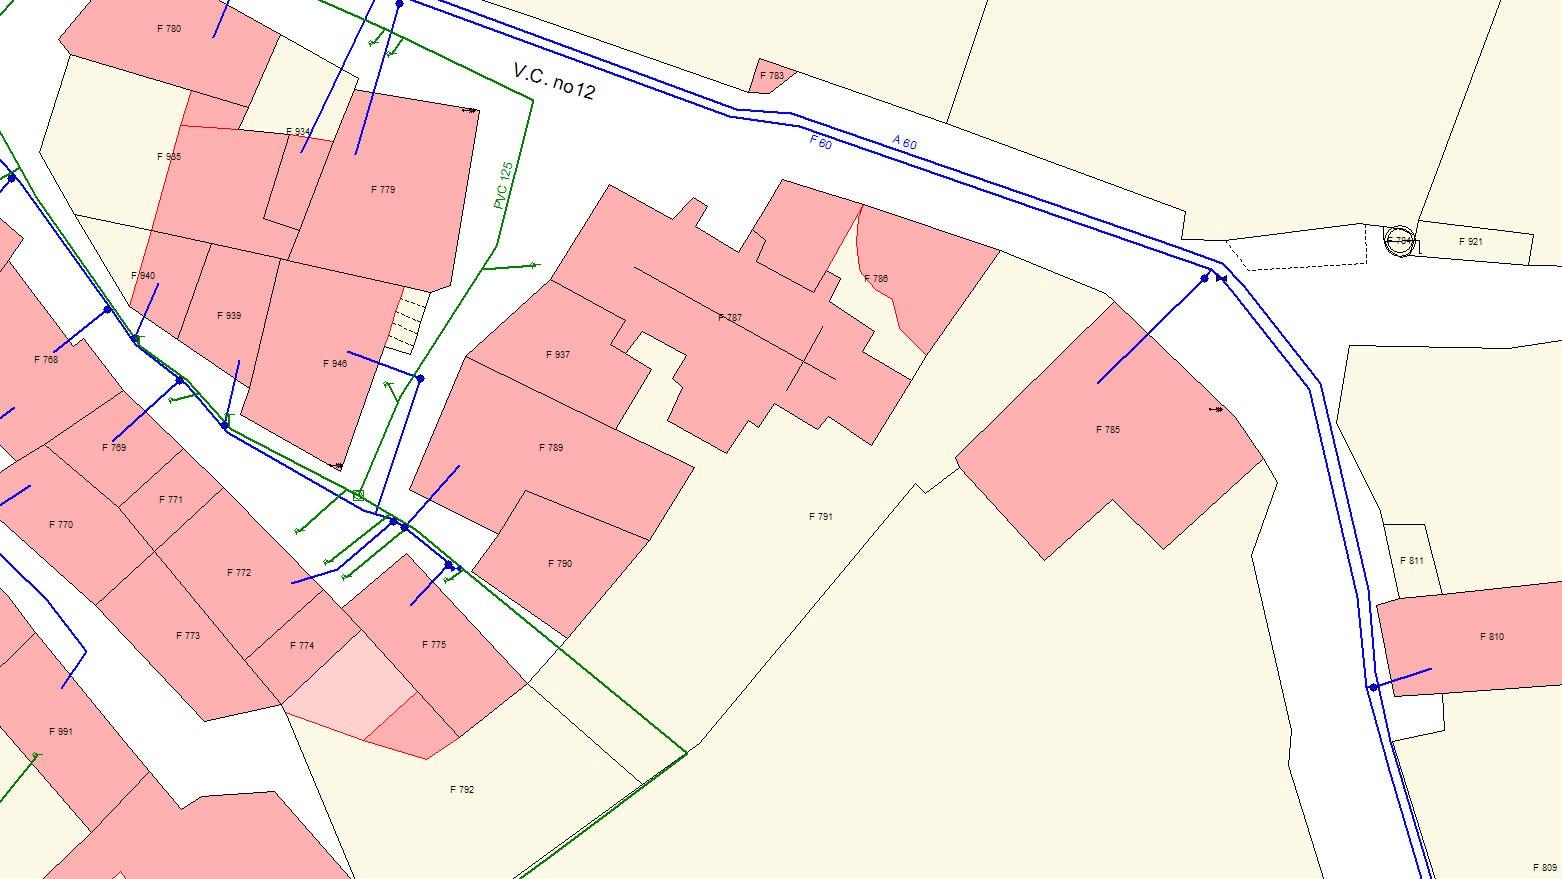 BETU | Urbanisme à Béziers | SIG et Cartographie